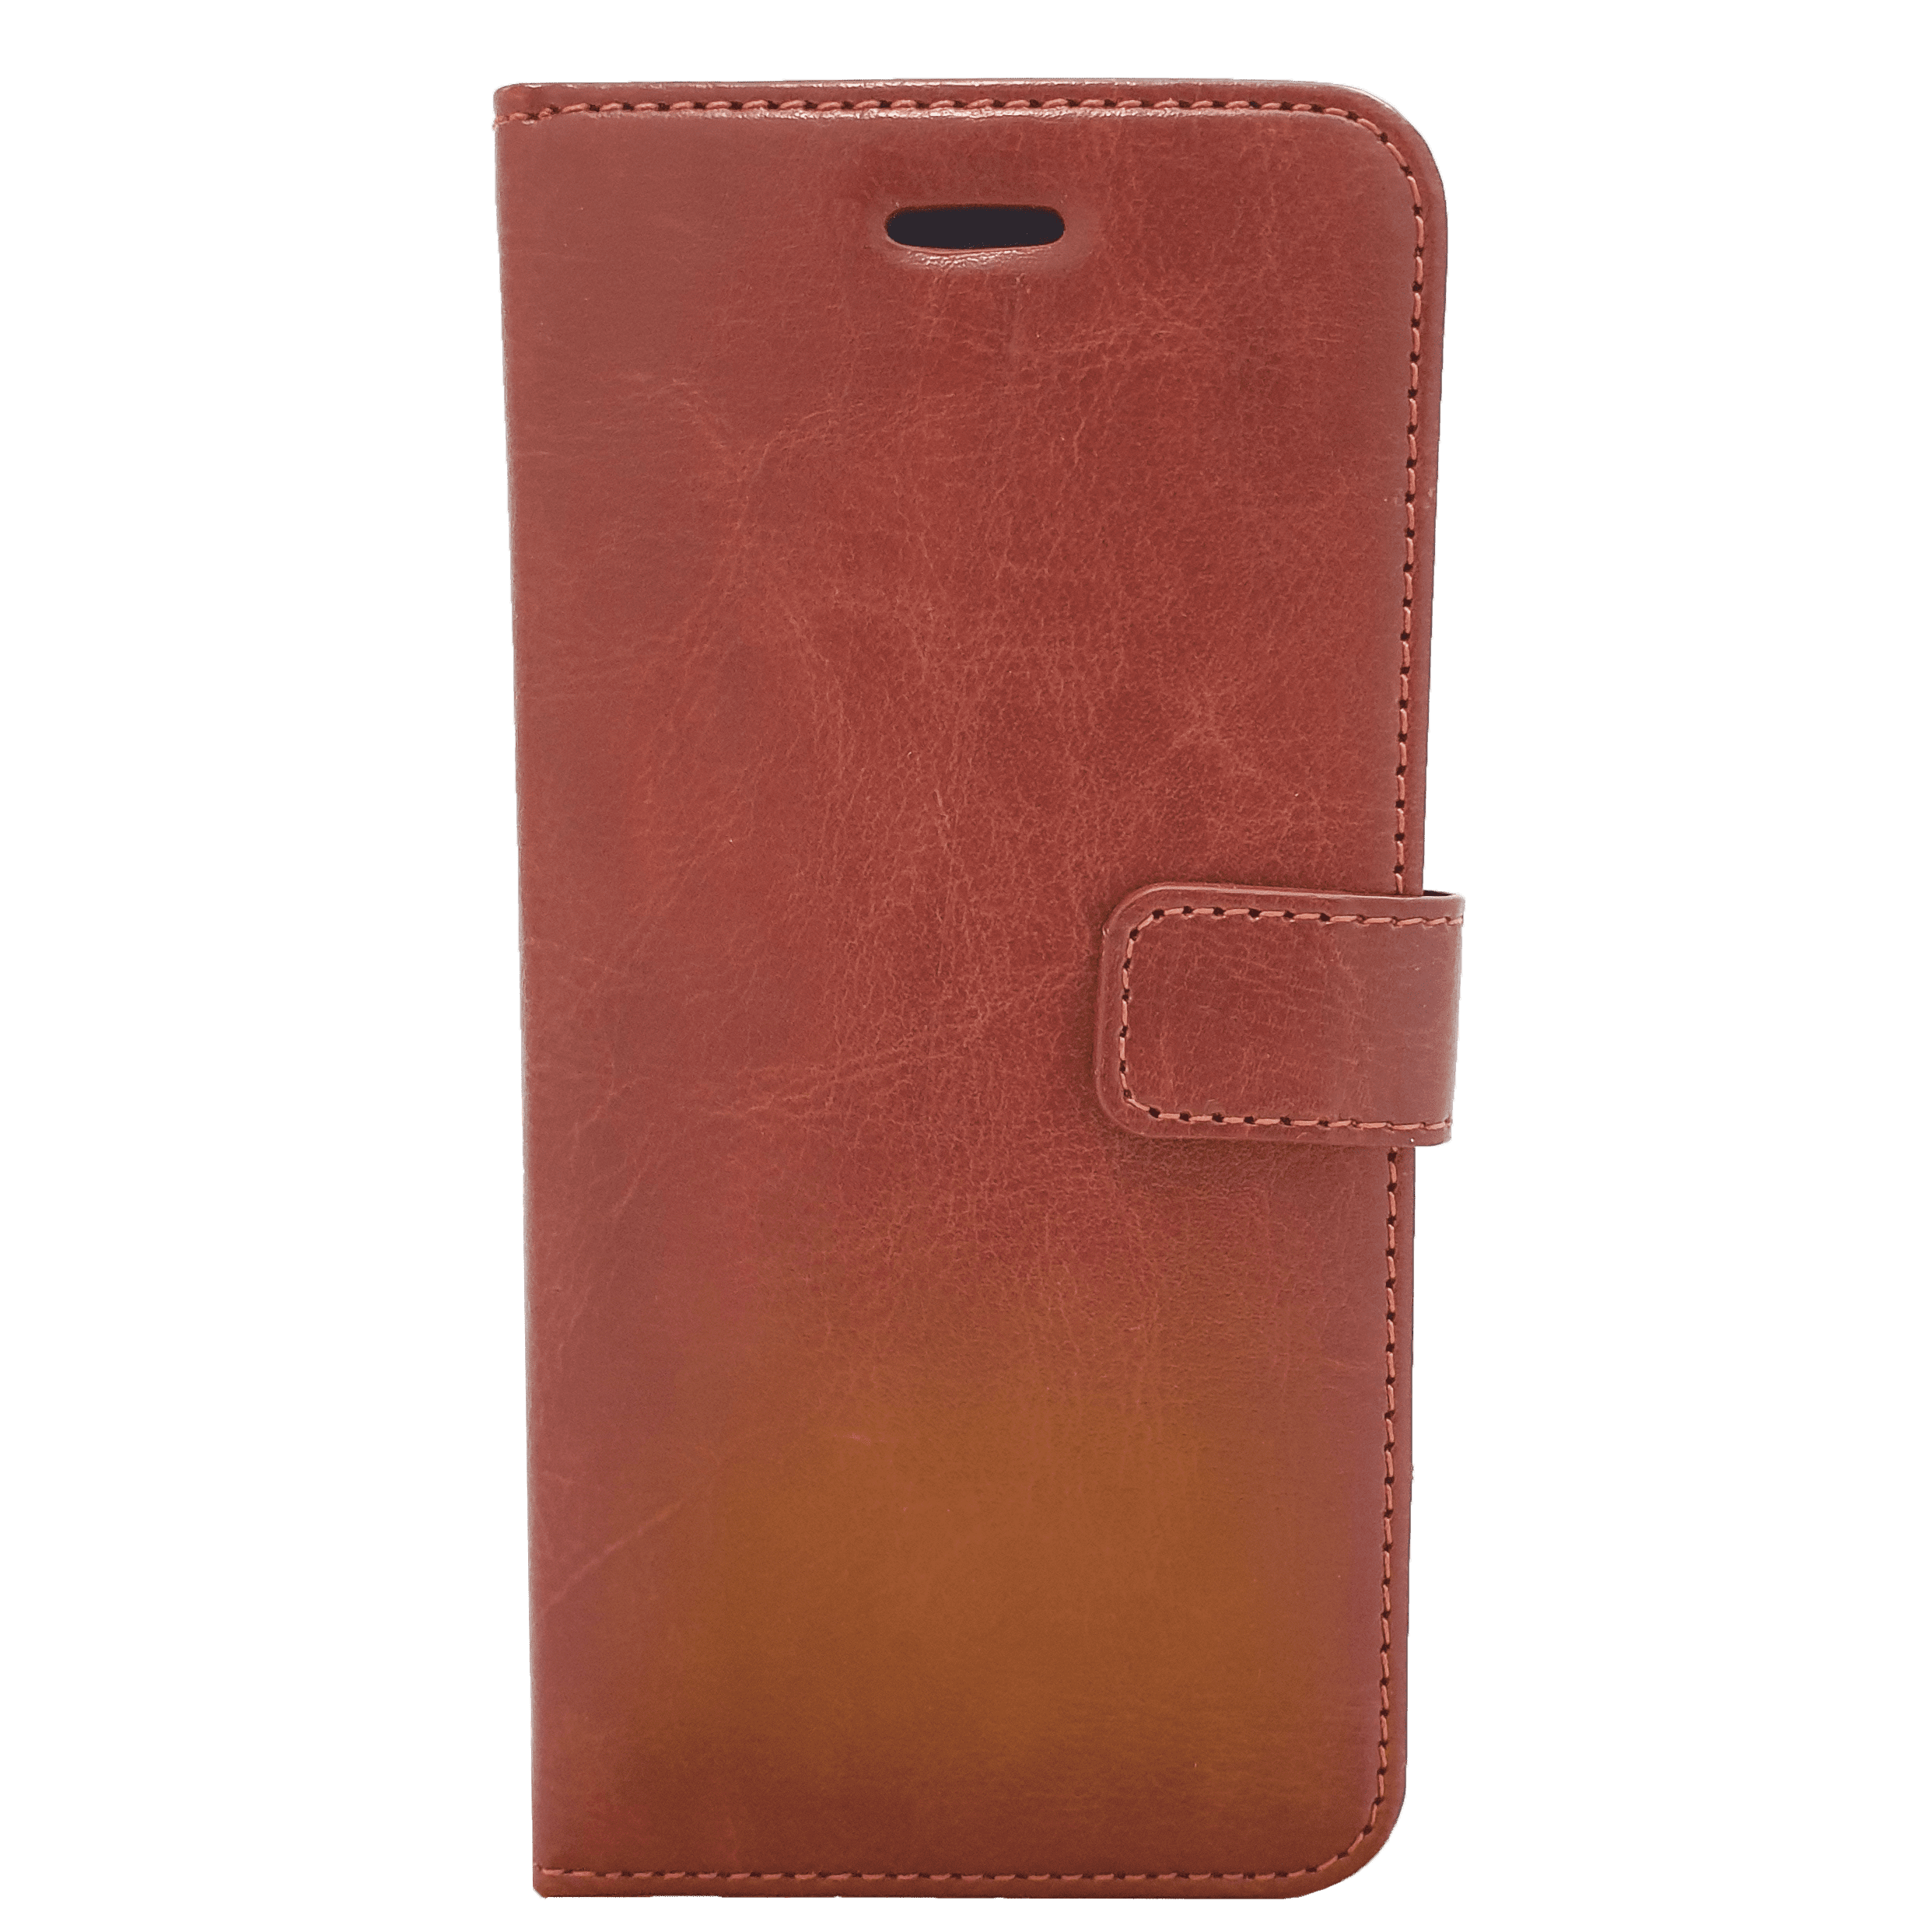 Mobilskal iPhone 6+ Röd/brun